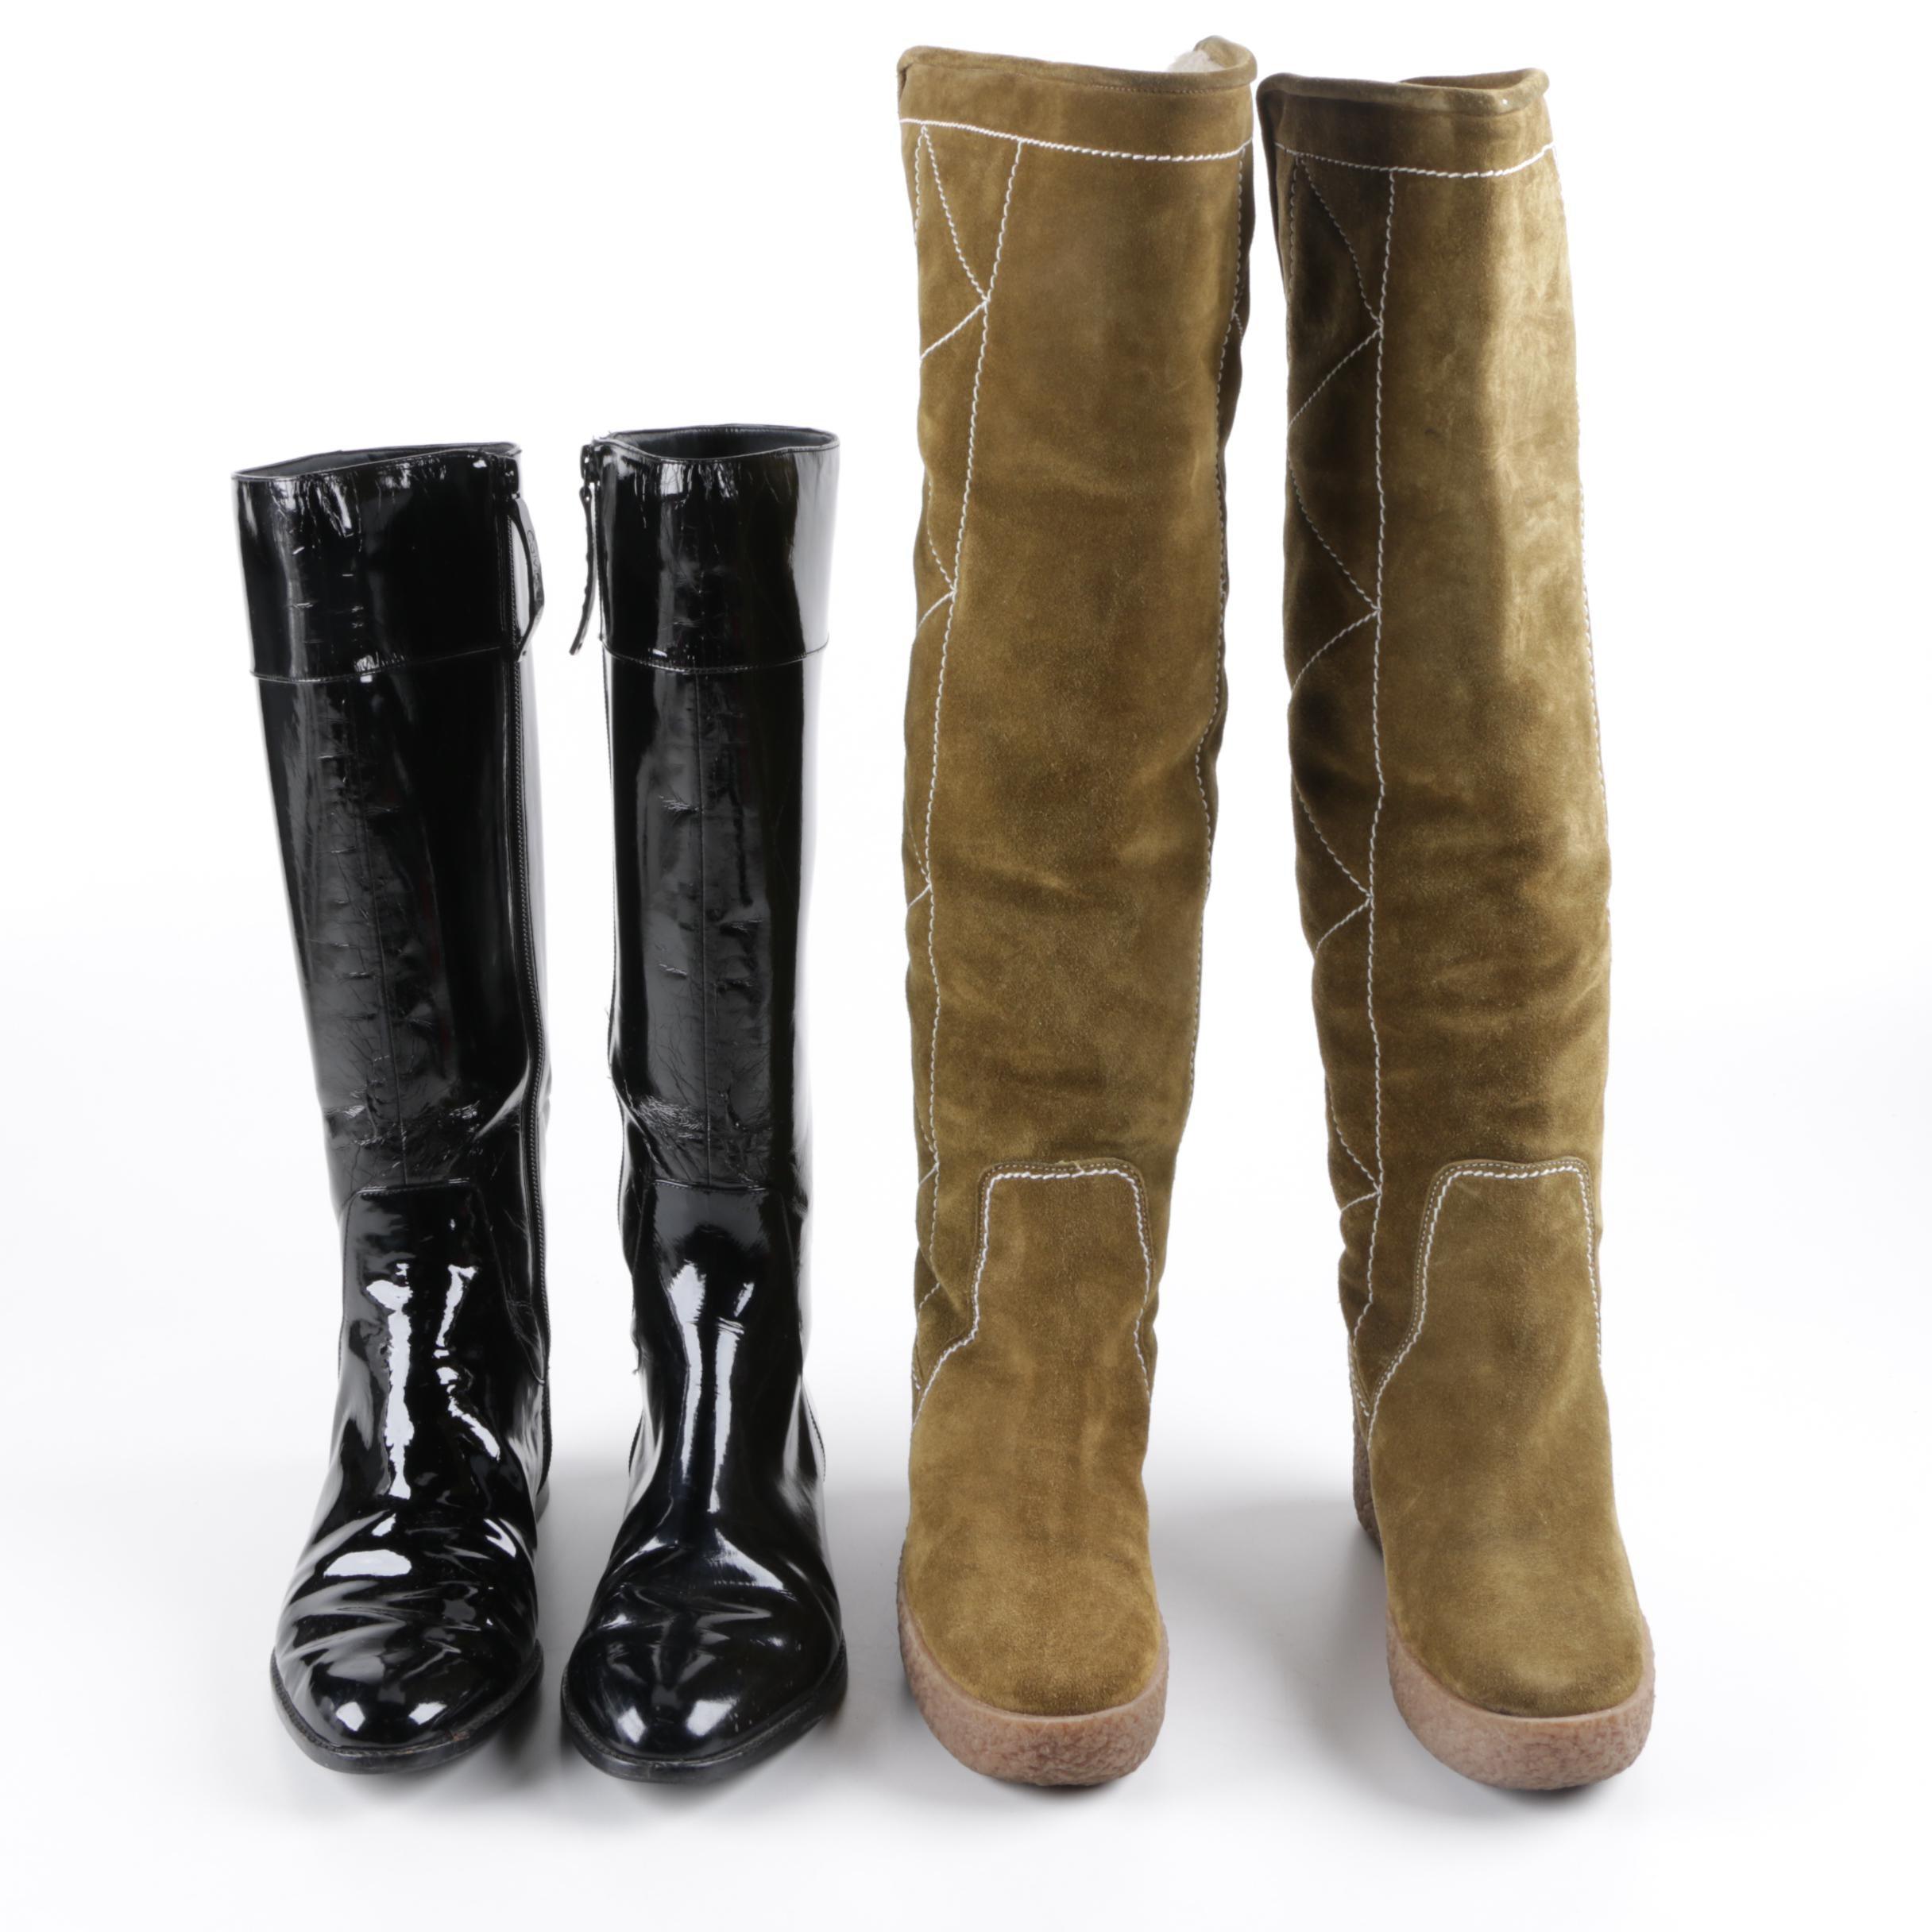 Women's Tall Boots Including Calvin Klein and KORS Michael Kors